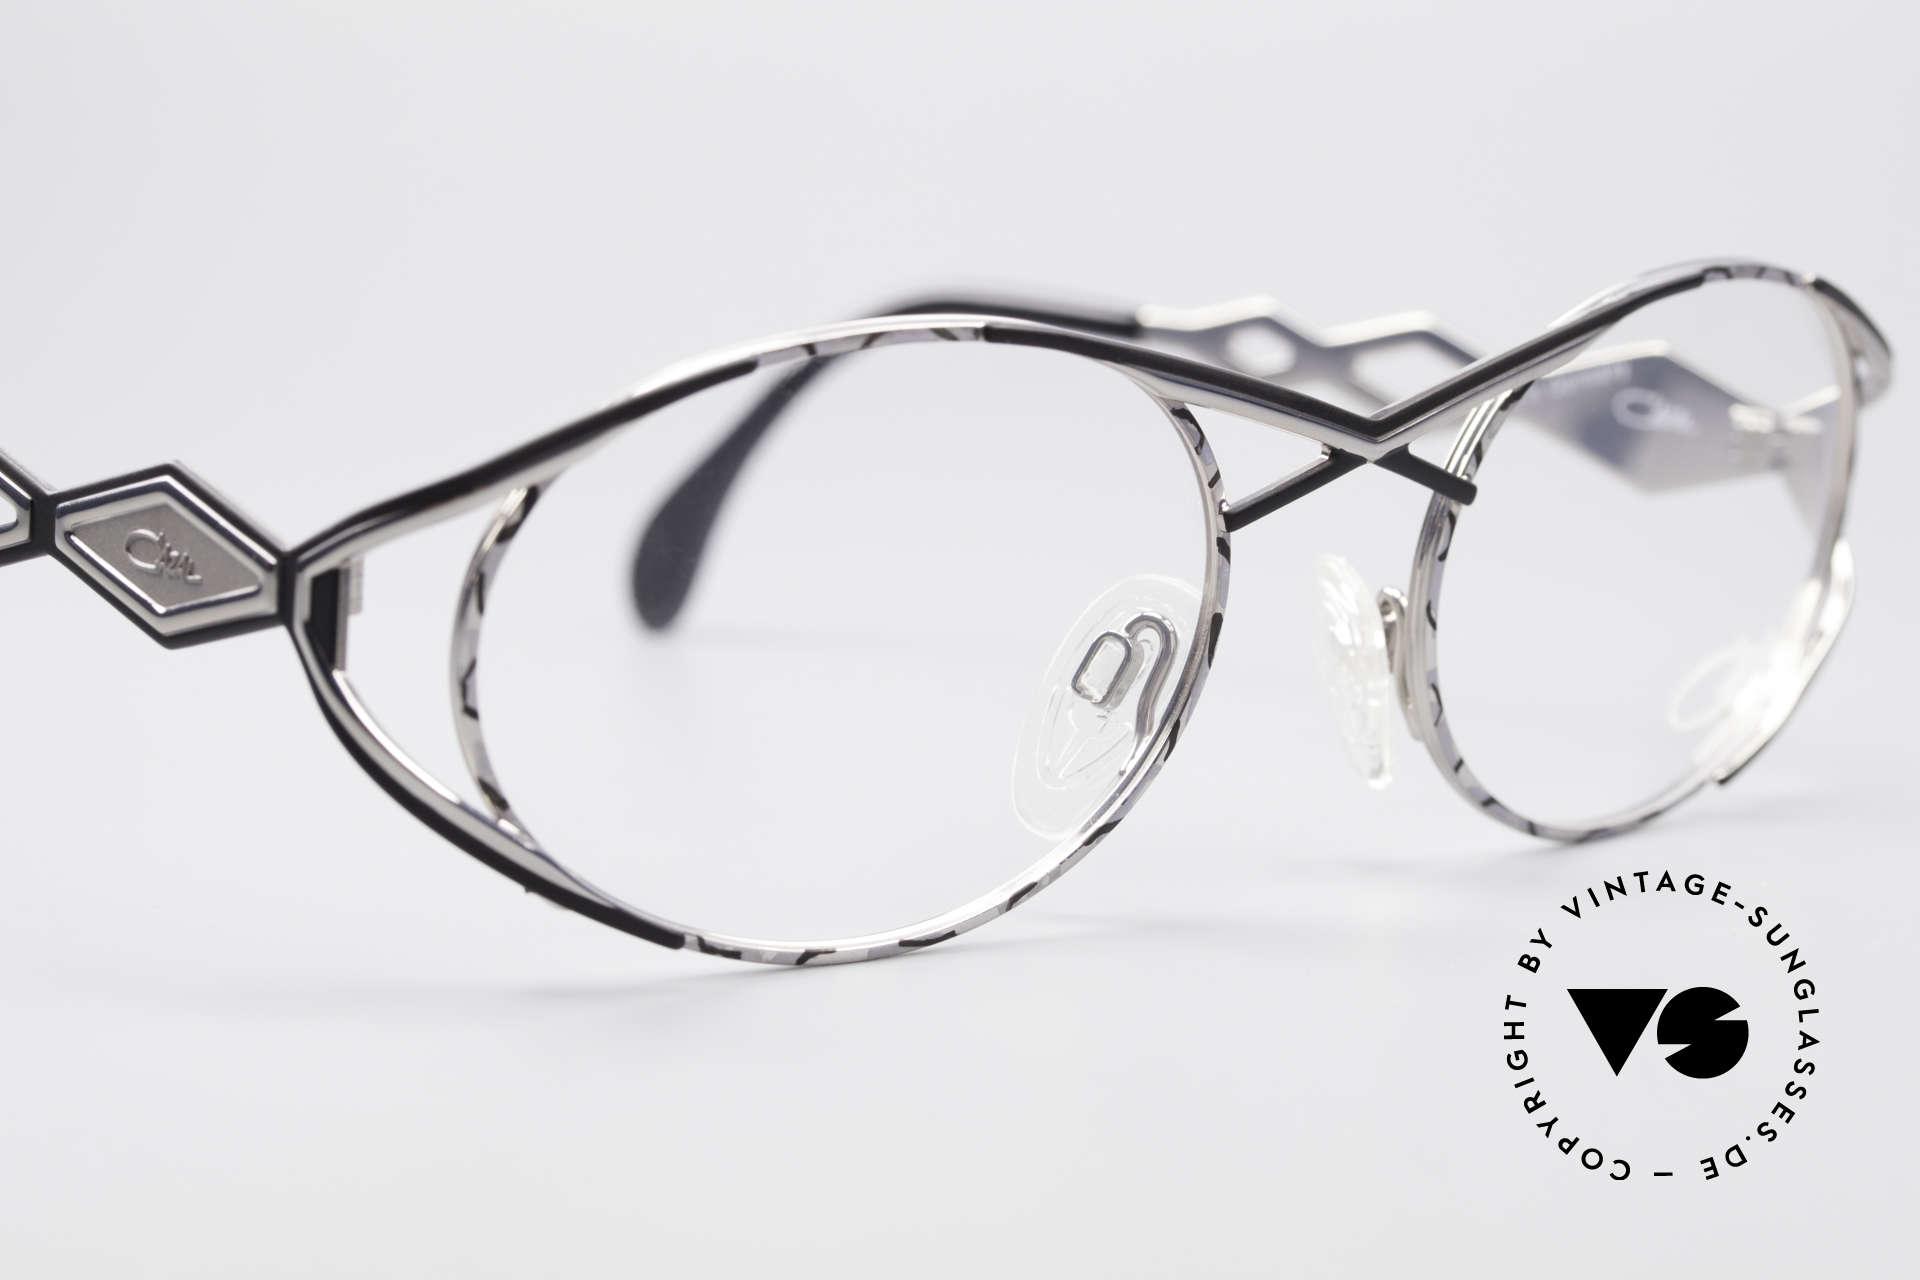 Cazal 977 Vintage 90s Eyeglasses Ladies, never worn (like all our vintage eyeglasses by Cazal), Made for Women